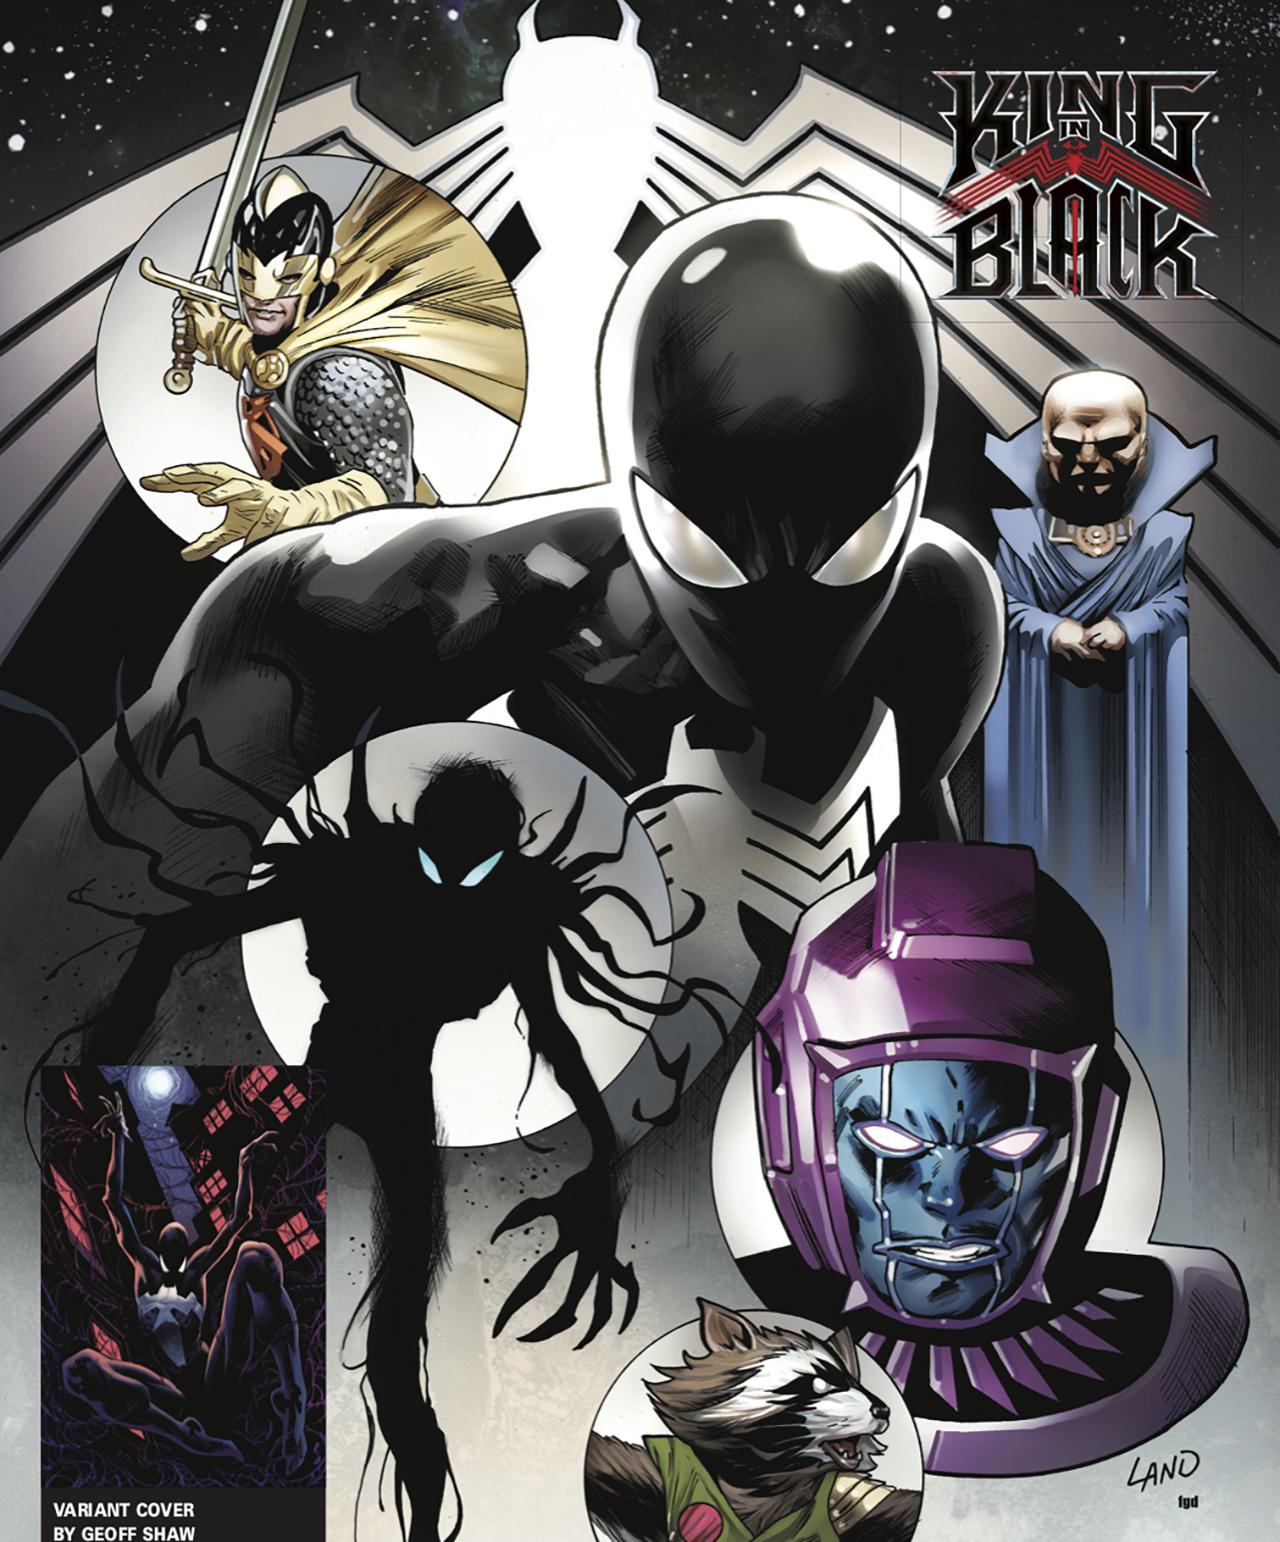 King In Black gets a Symbiote Spider-Man prequel | GamesRadar+